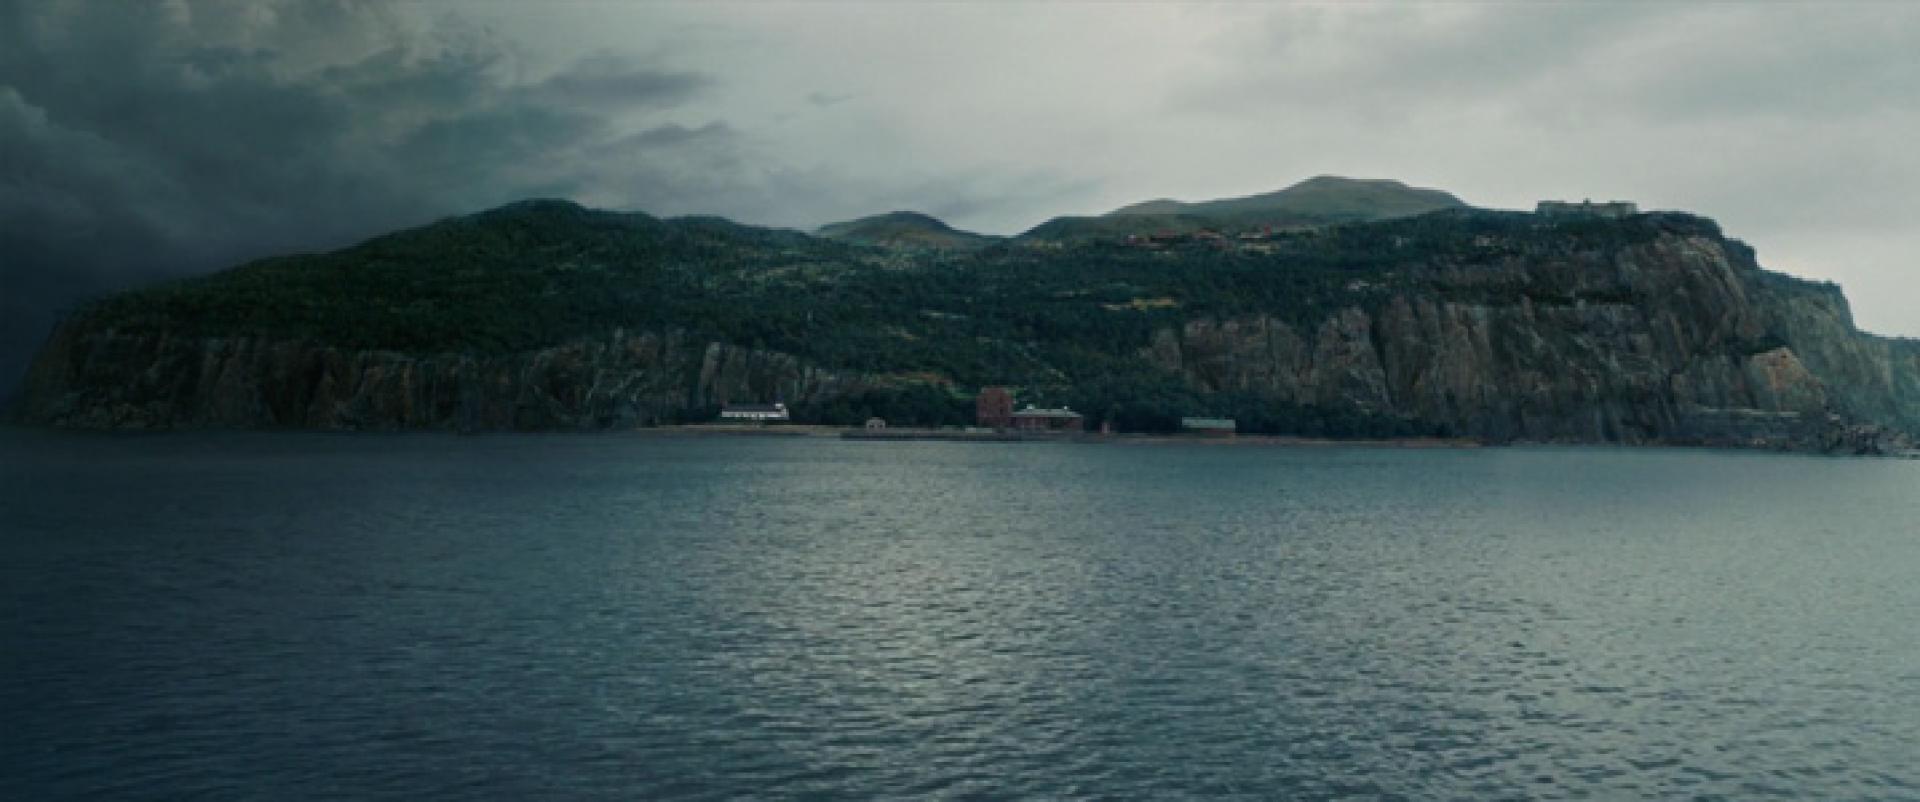 Shutter Island - Viharsziget (2010)